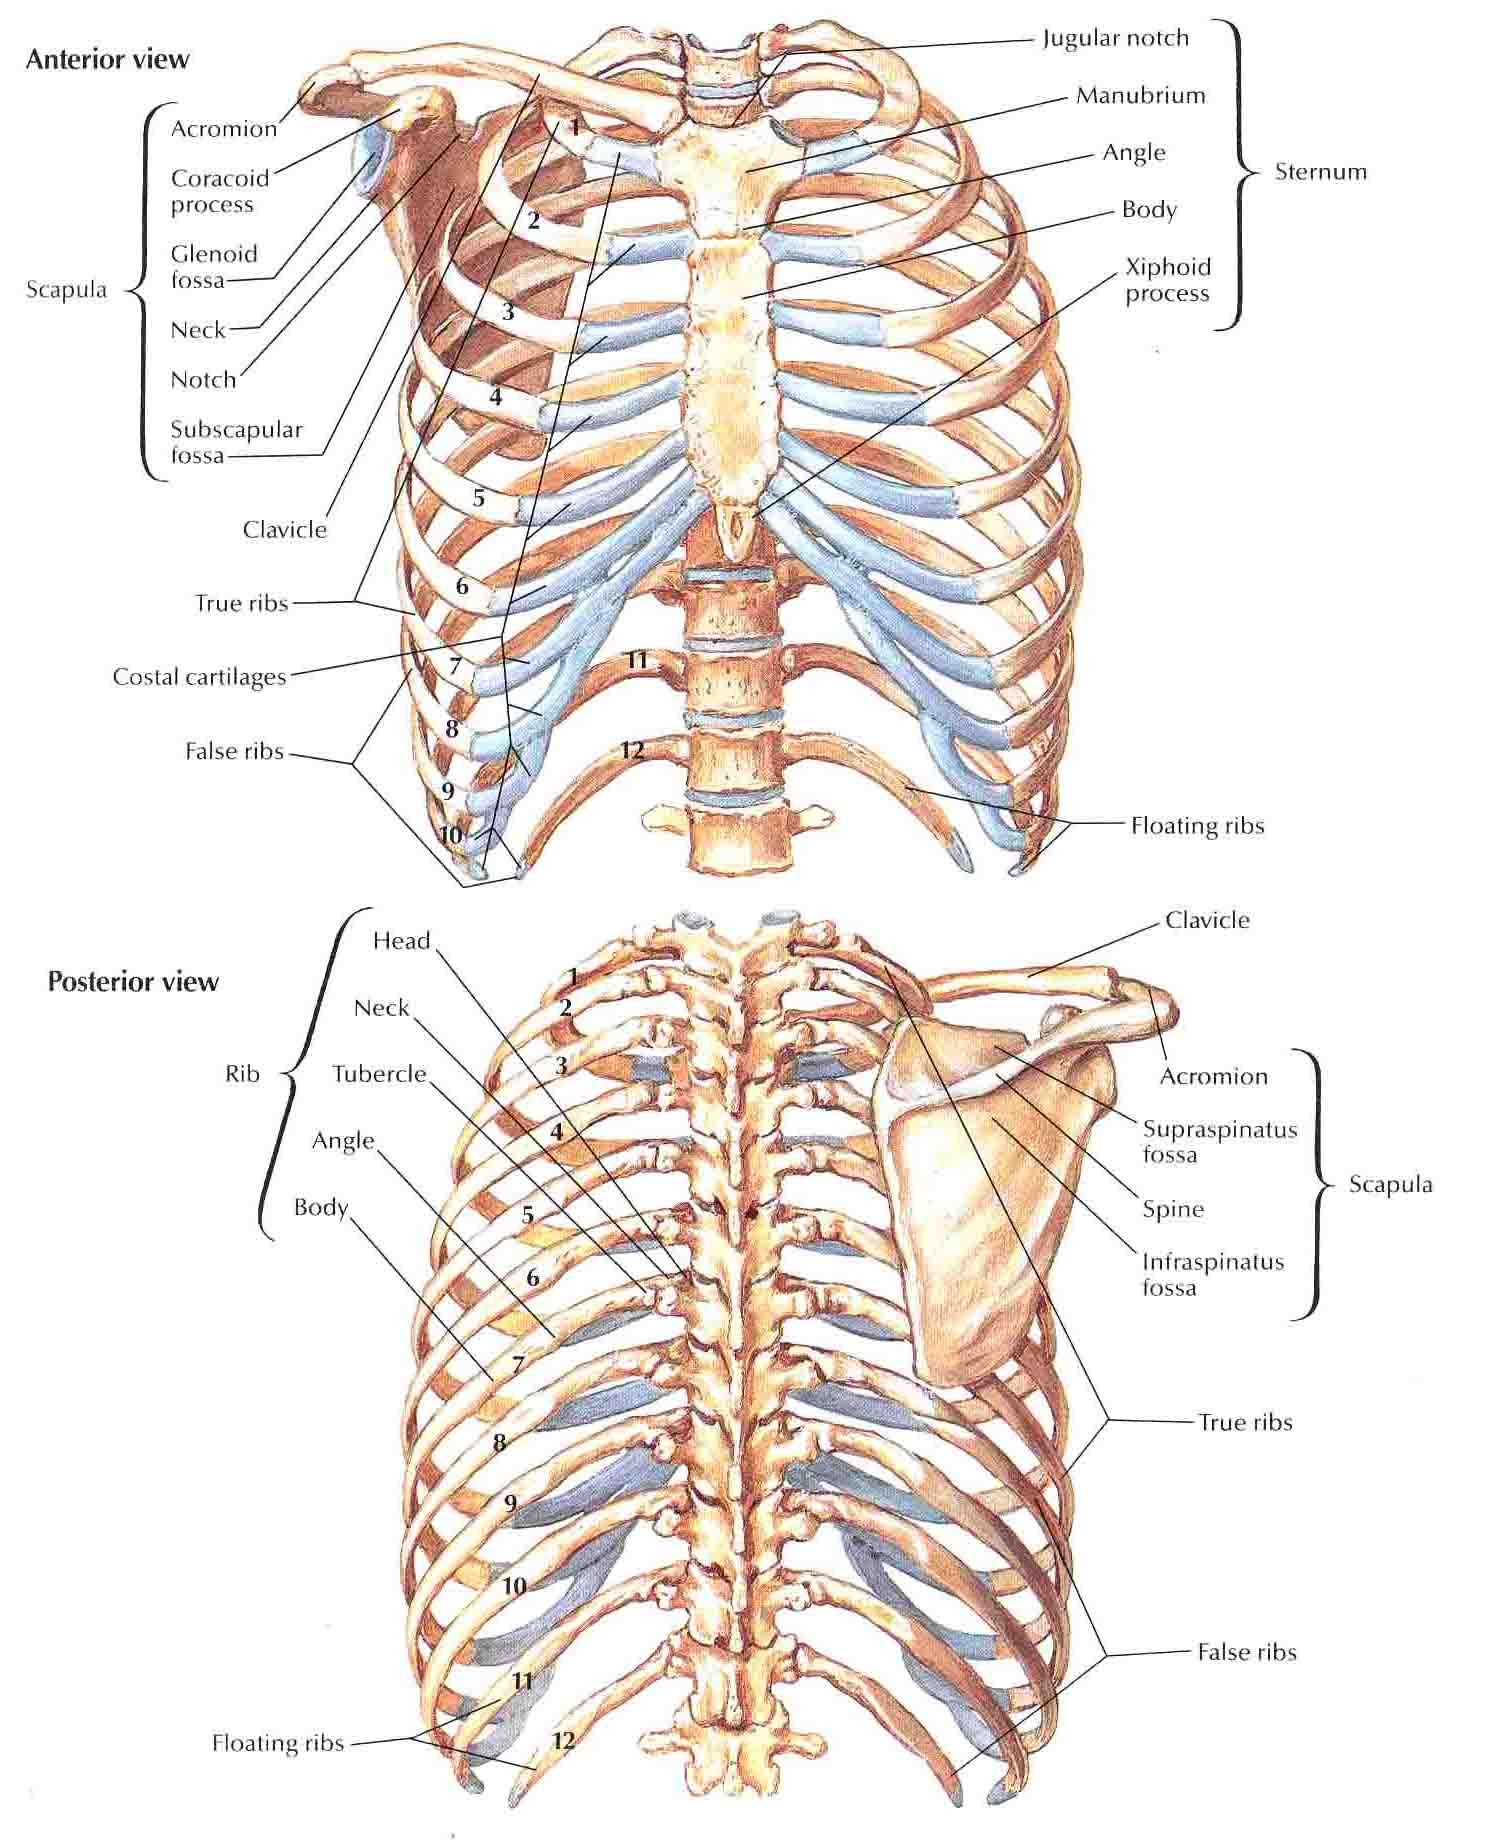 bedahunmuh.files.wordpress.com 2010 05 bony-framework-of-thorax.jpg ...